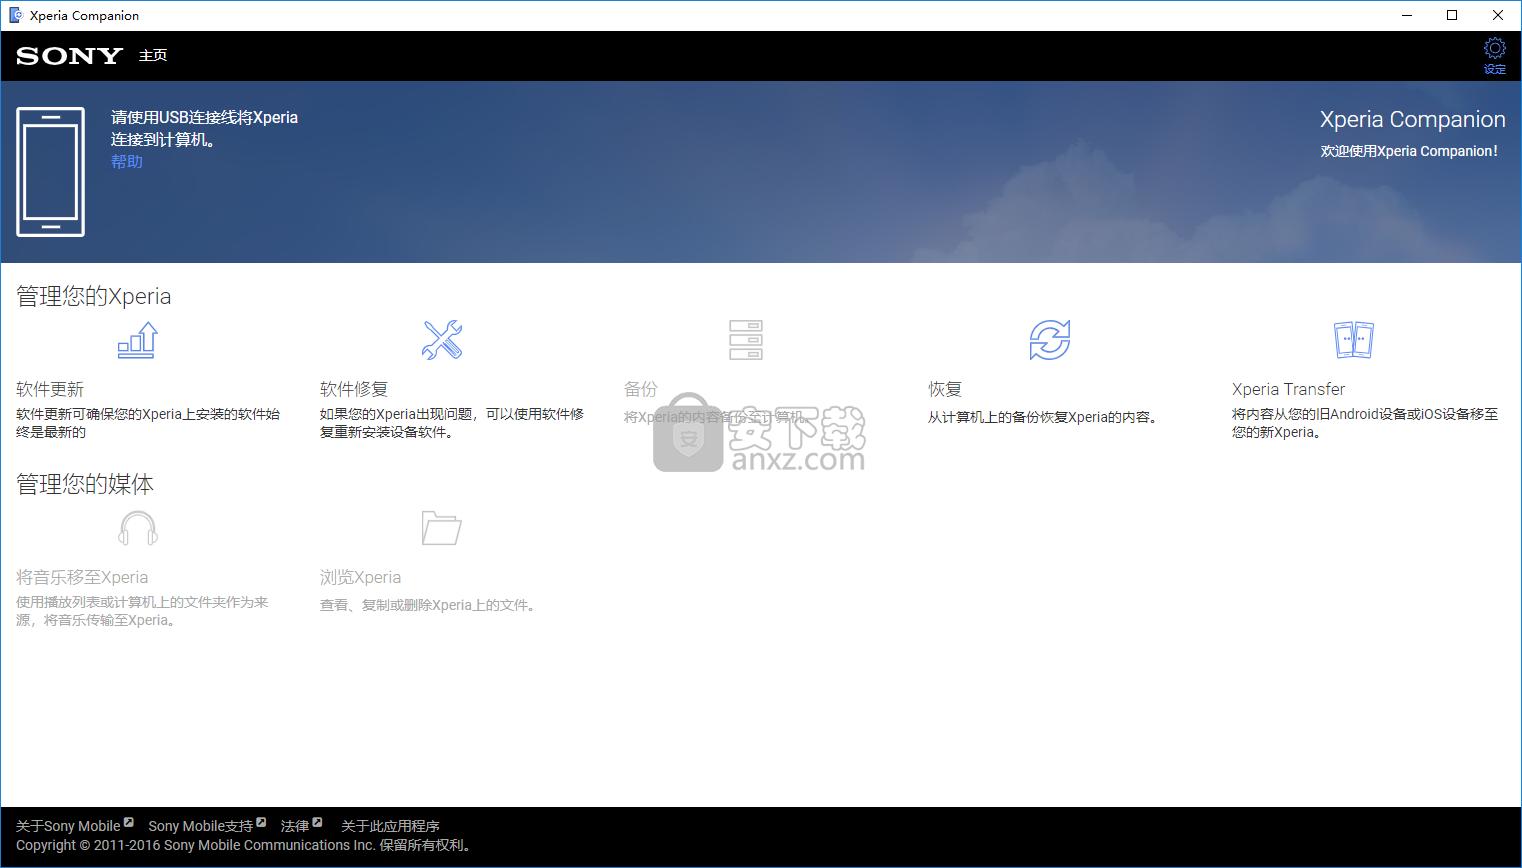 Xperia Companion(Xperia设备管理软件)